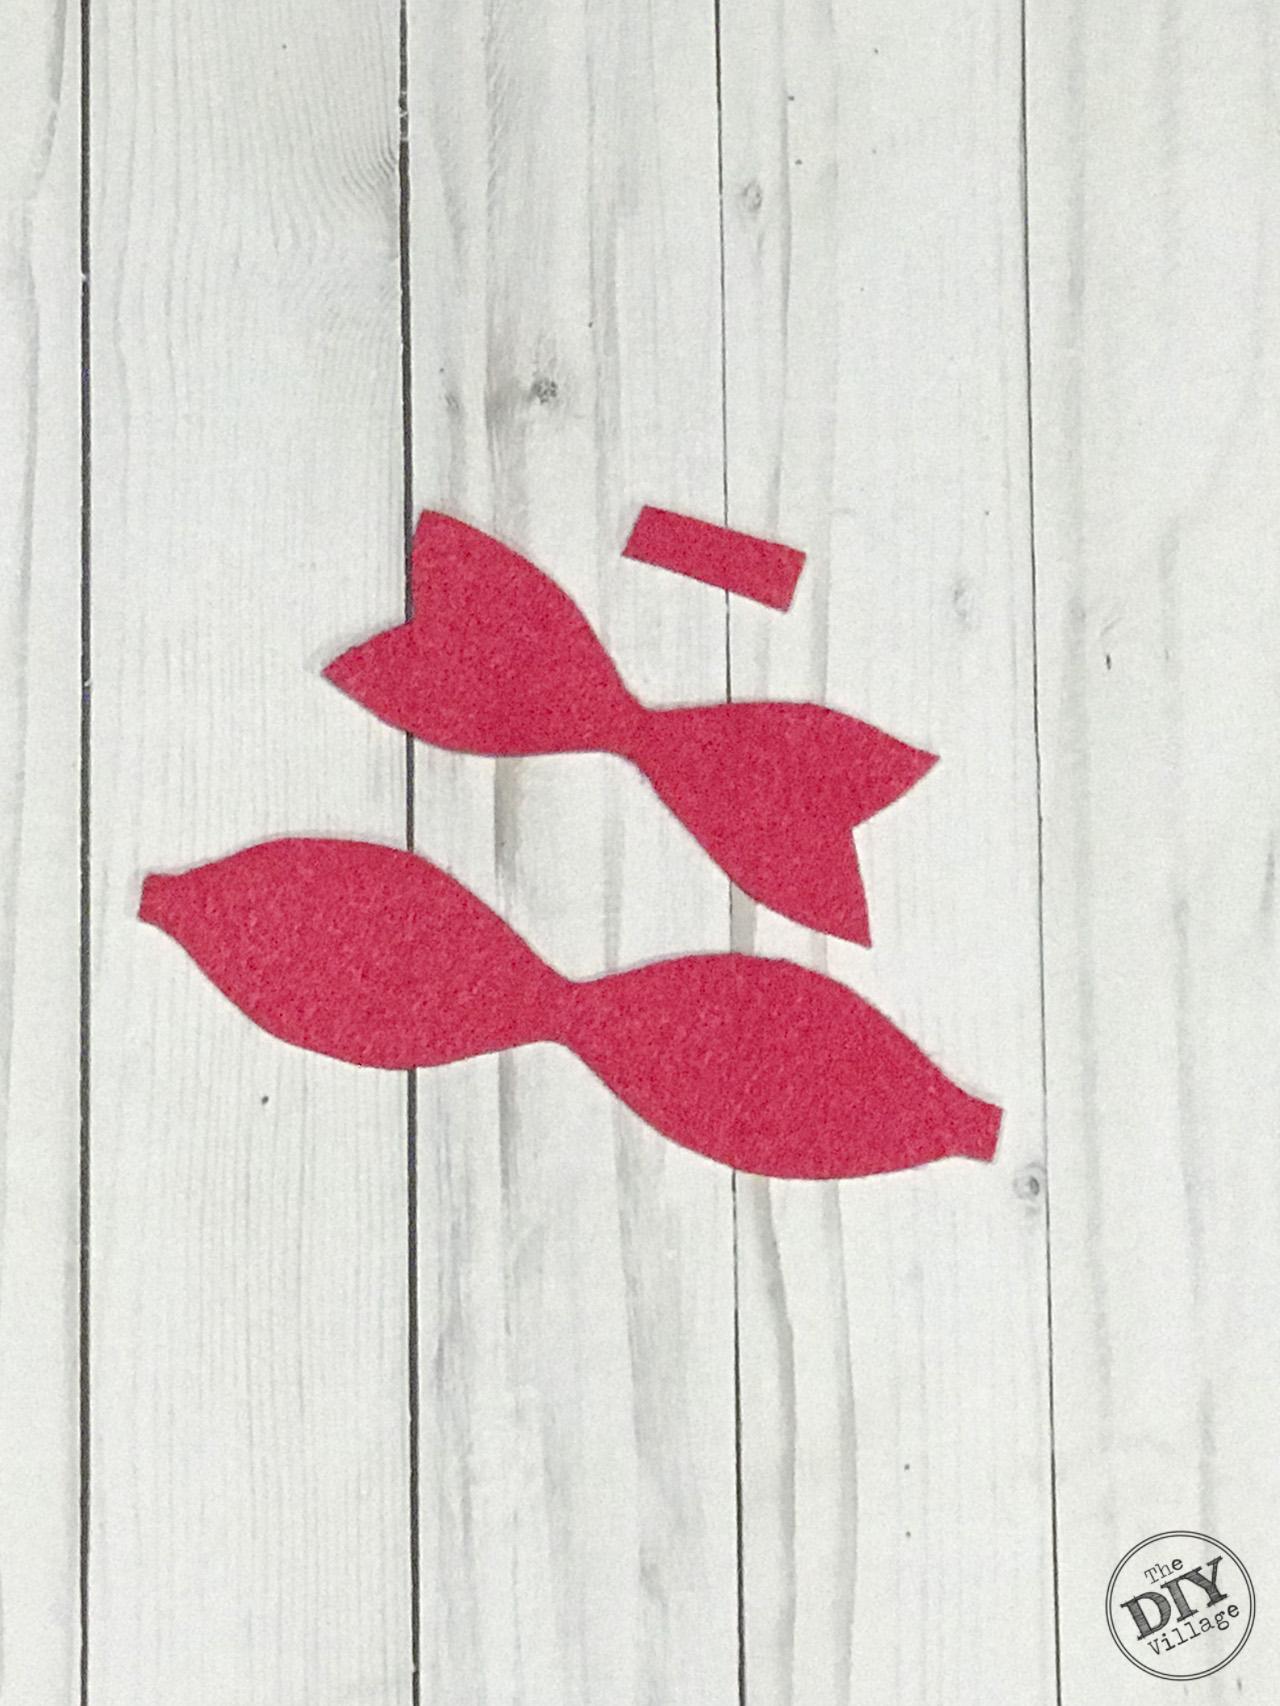 Pink felt bow cut out shapes